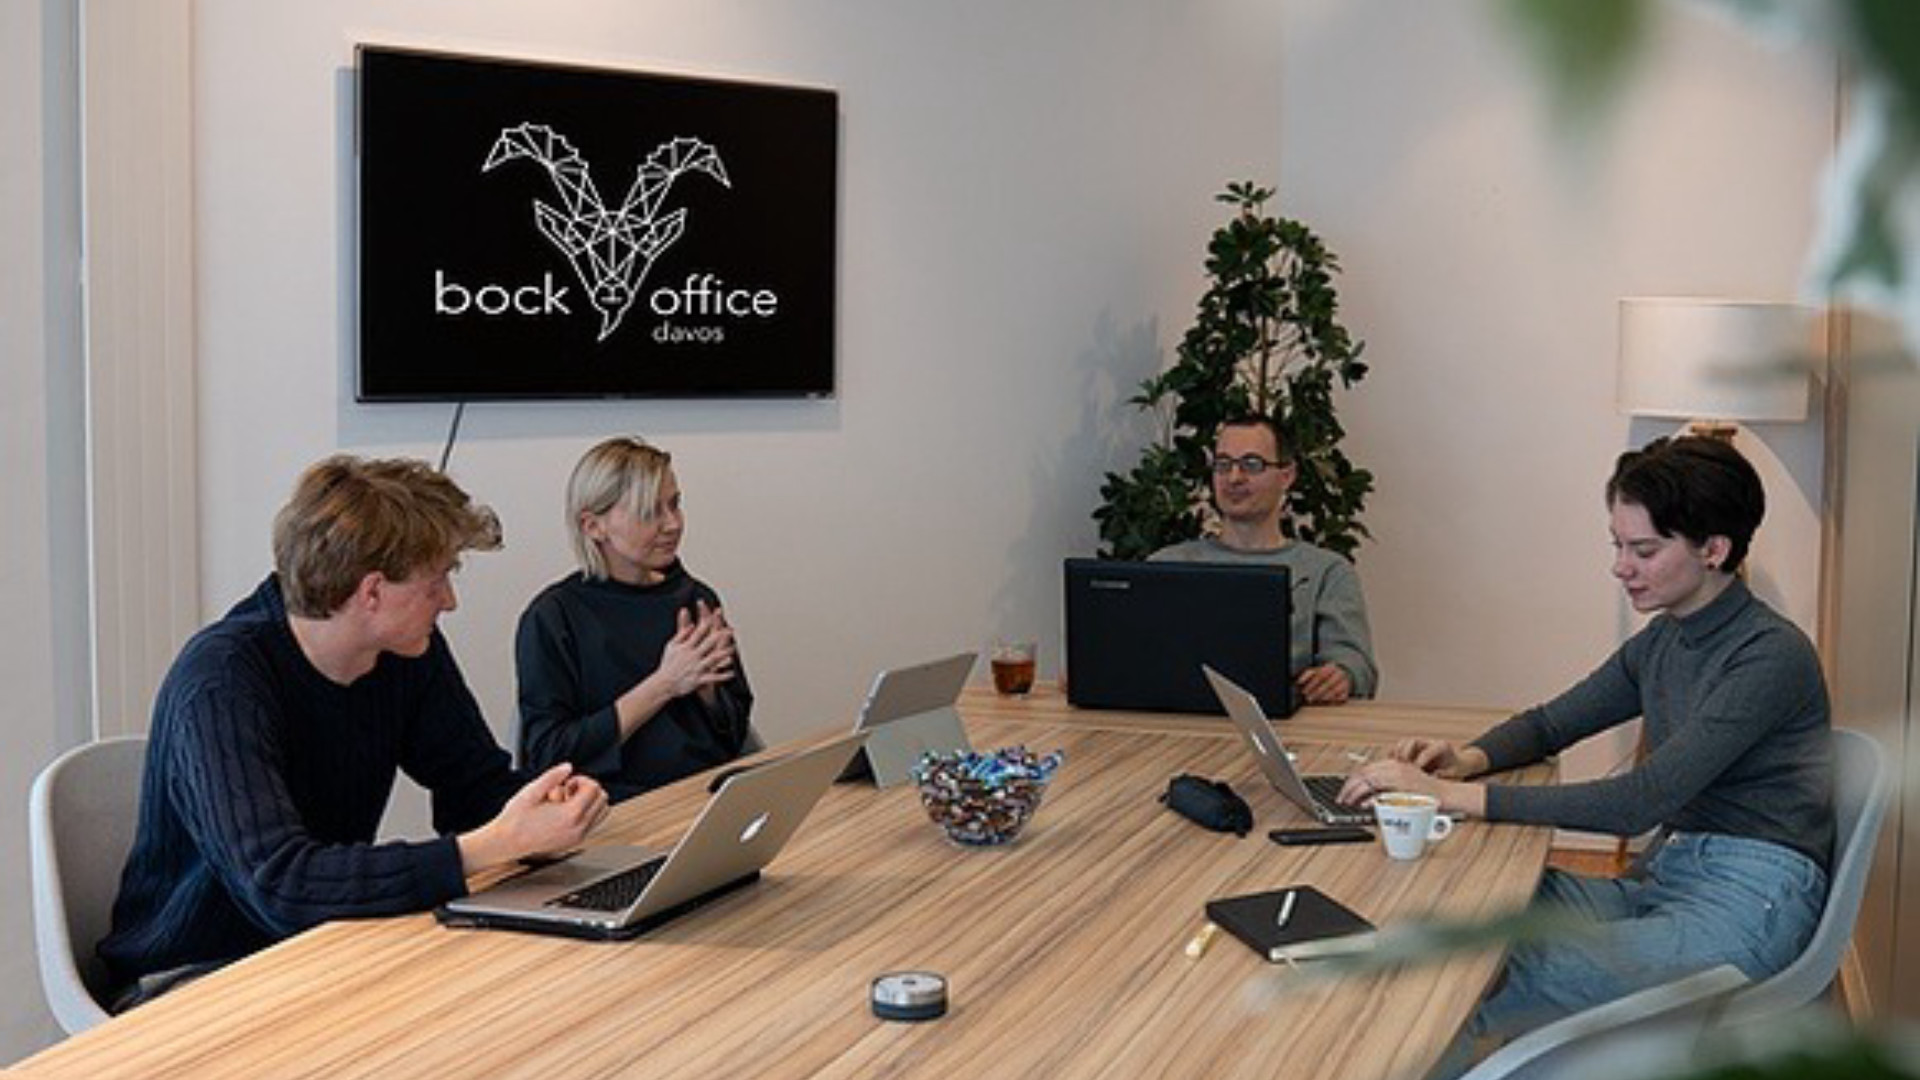 BockOffice Davos